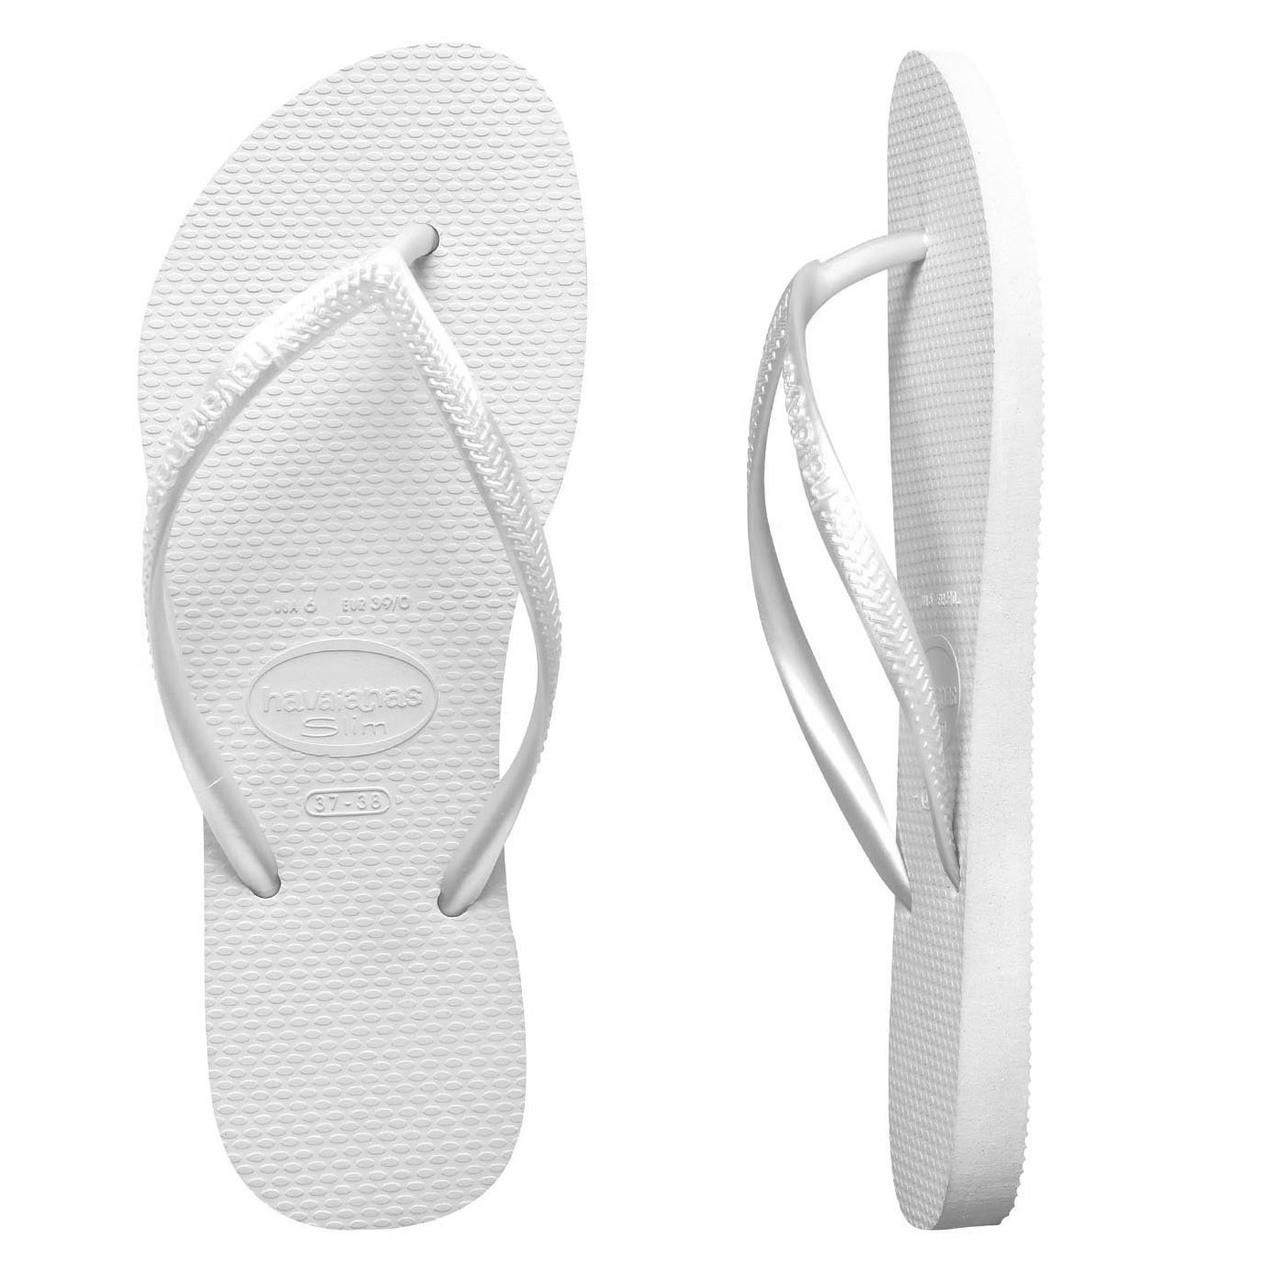 95611d158 Havaianas Slim Metallic White 3536 - Golders Toowoomba